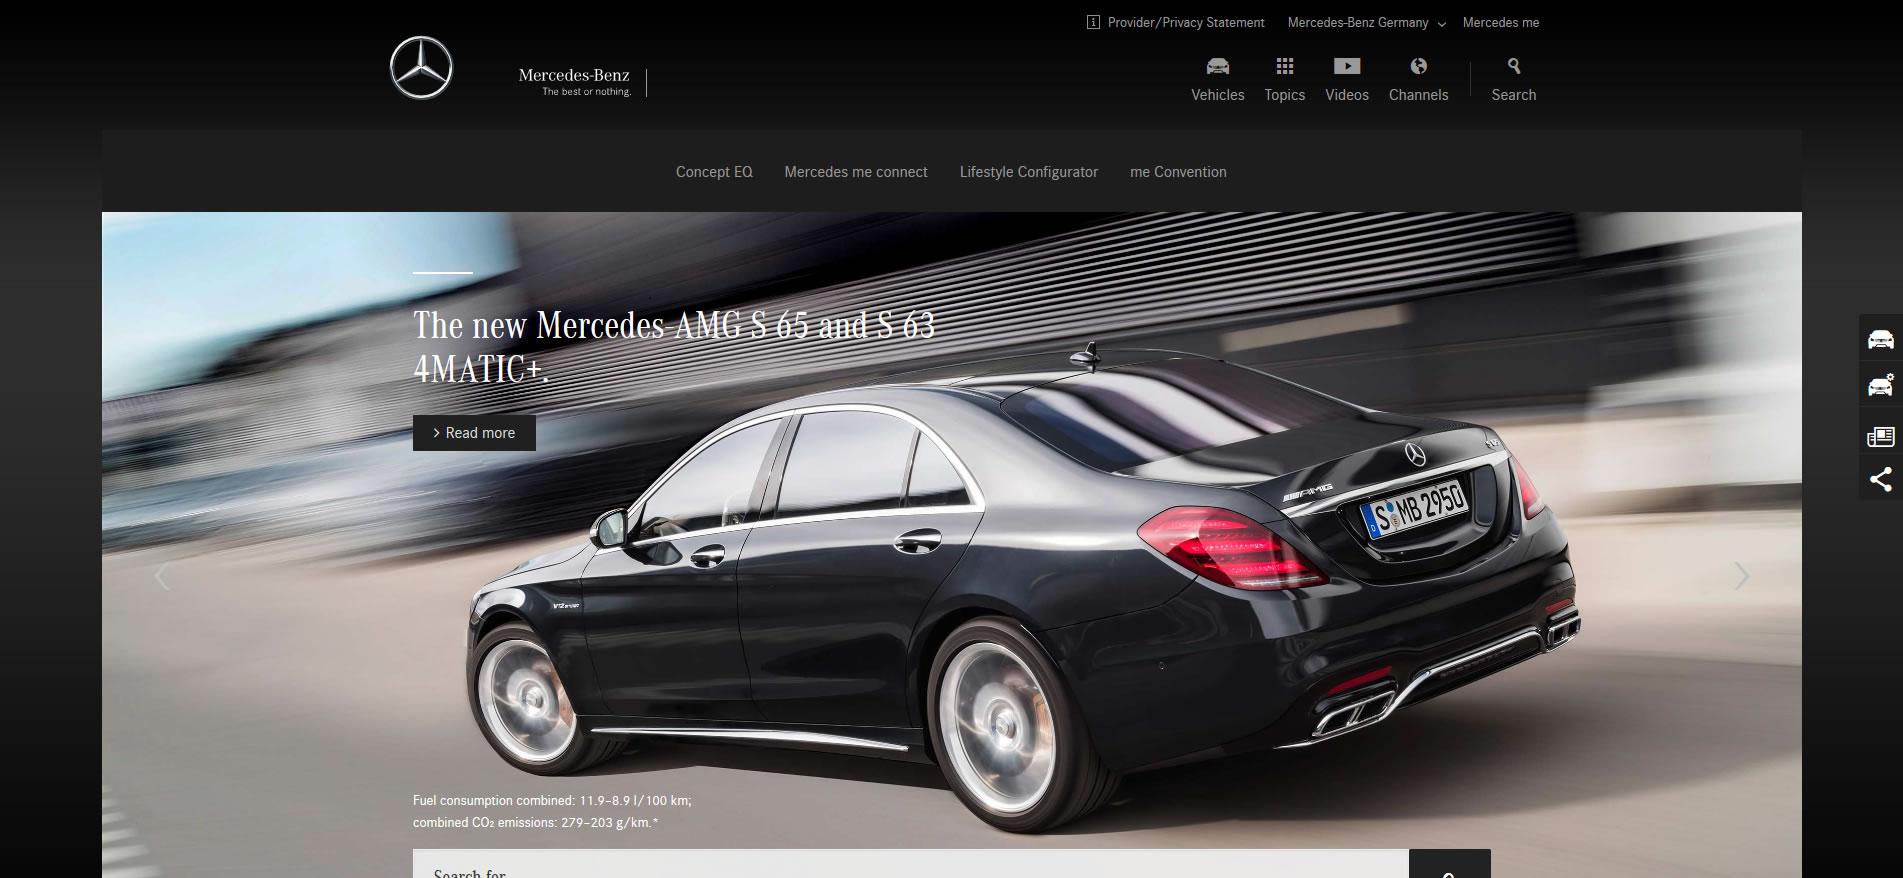 Mercedes benz international news internetfunke for International mercedes benz